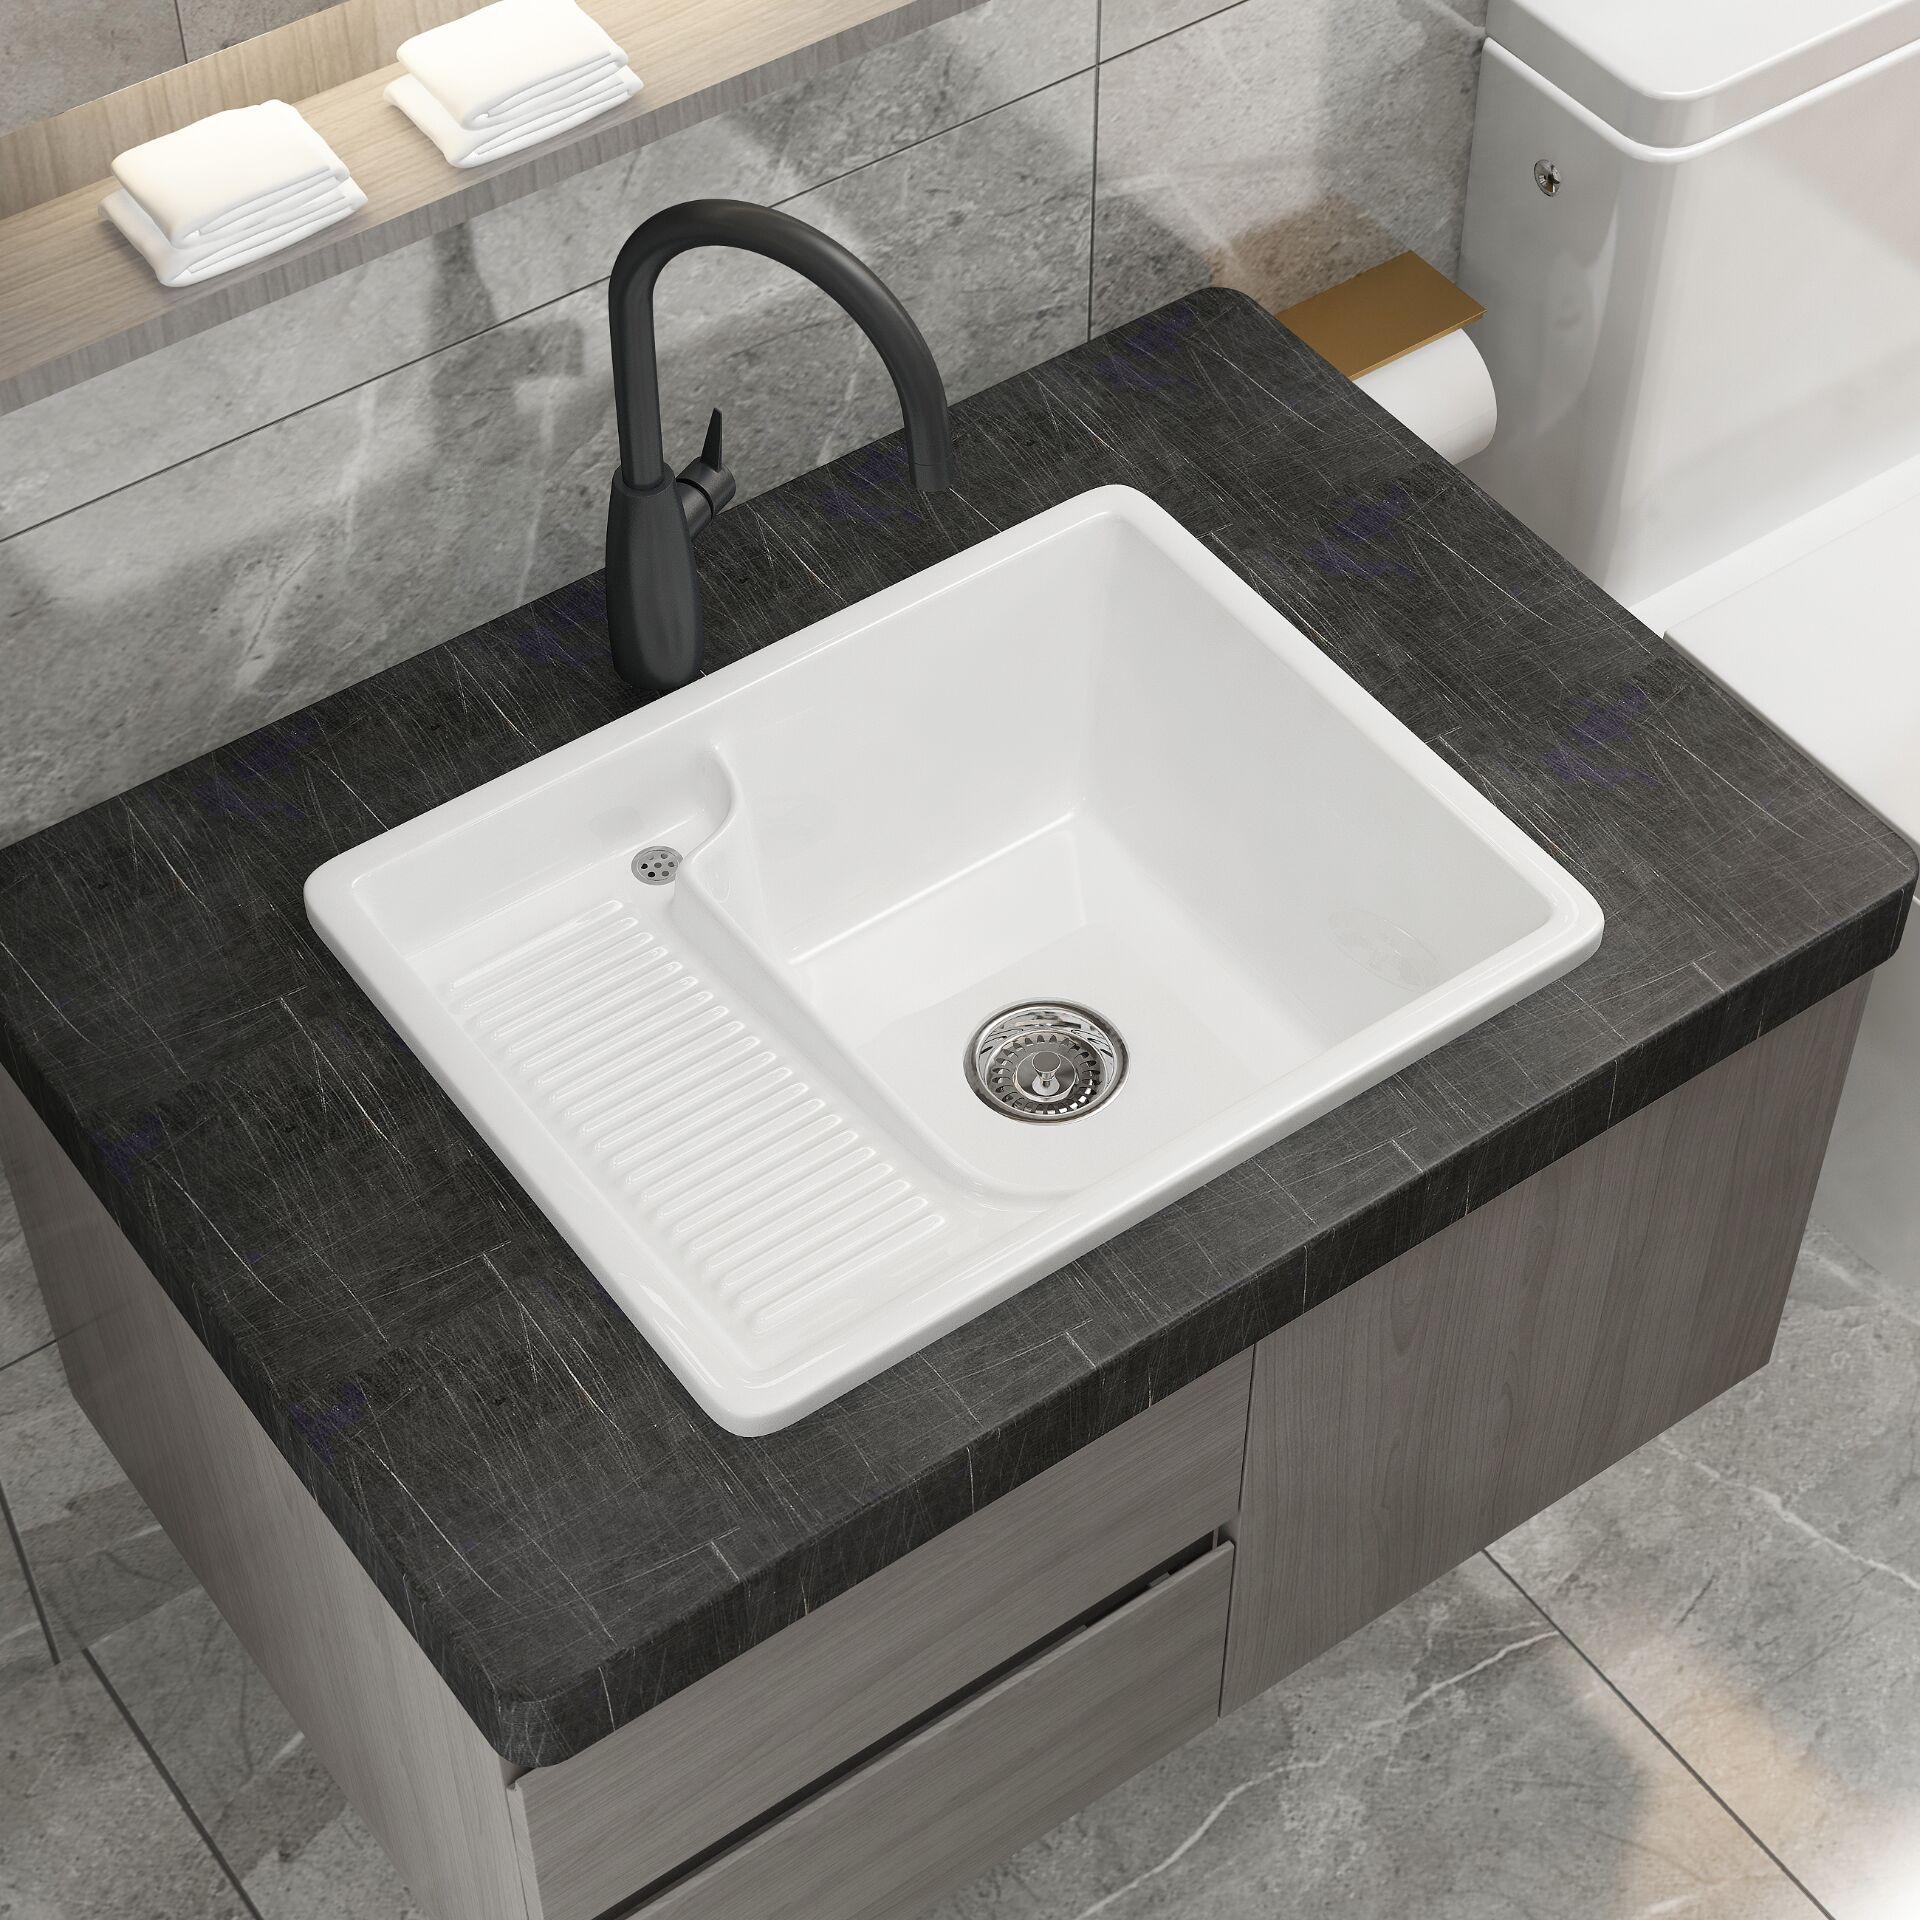 chaozhou ceramic laundry wash basin sink for washing clothes buy ceramic wash basin laundry wash basin chaozhou laundry wash basin product on